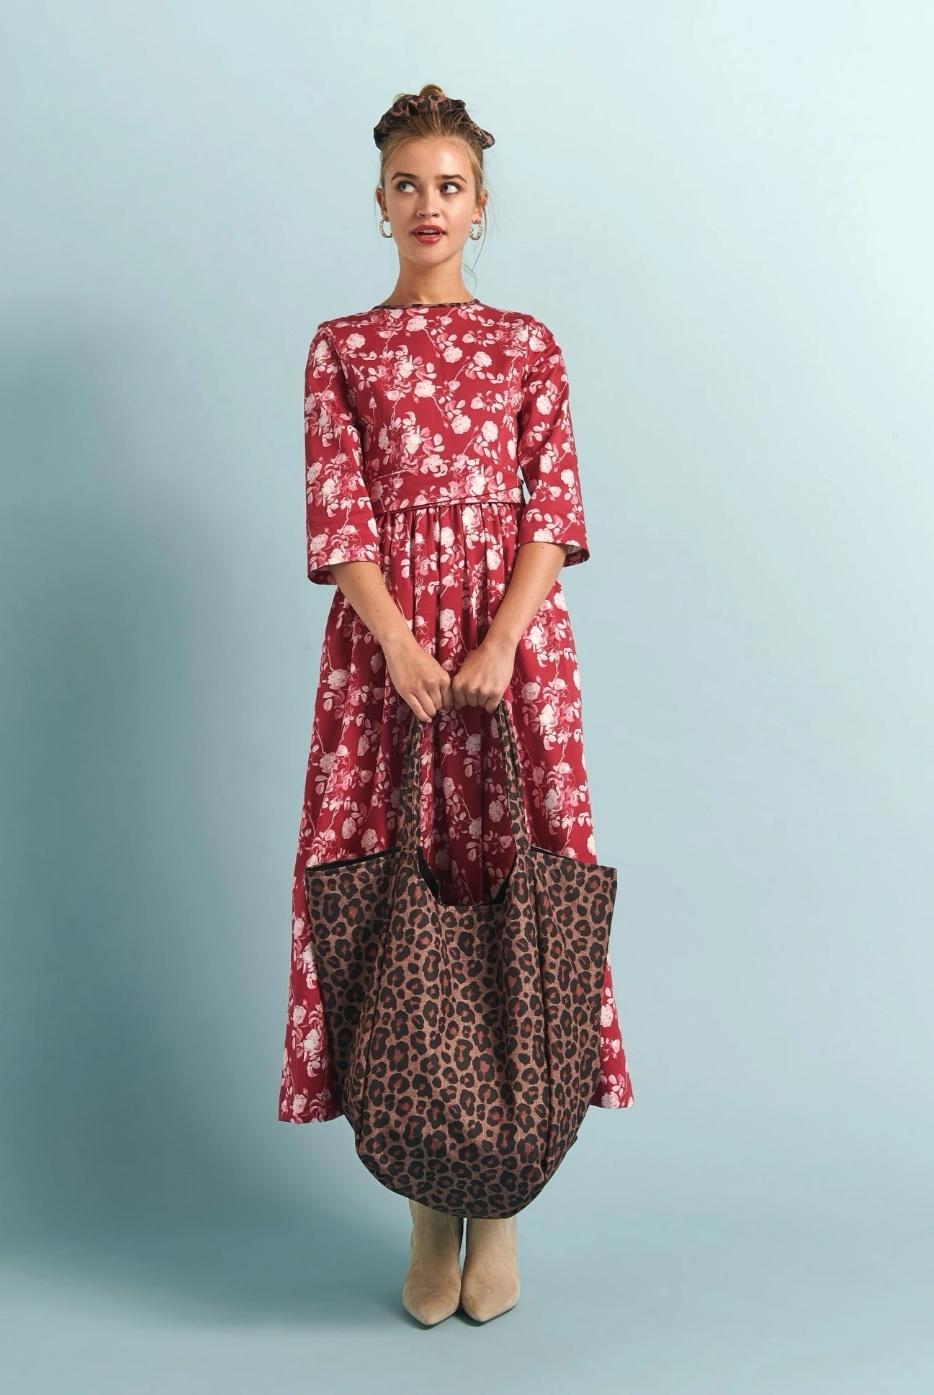 BELLA BAG (LEOPARD) - KARAVAN CLOTHING